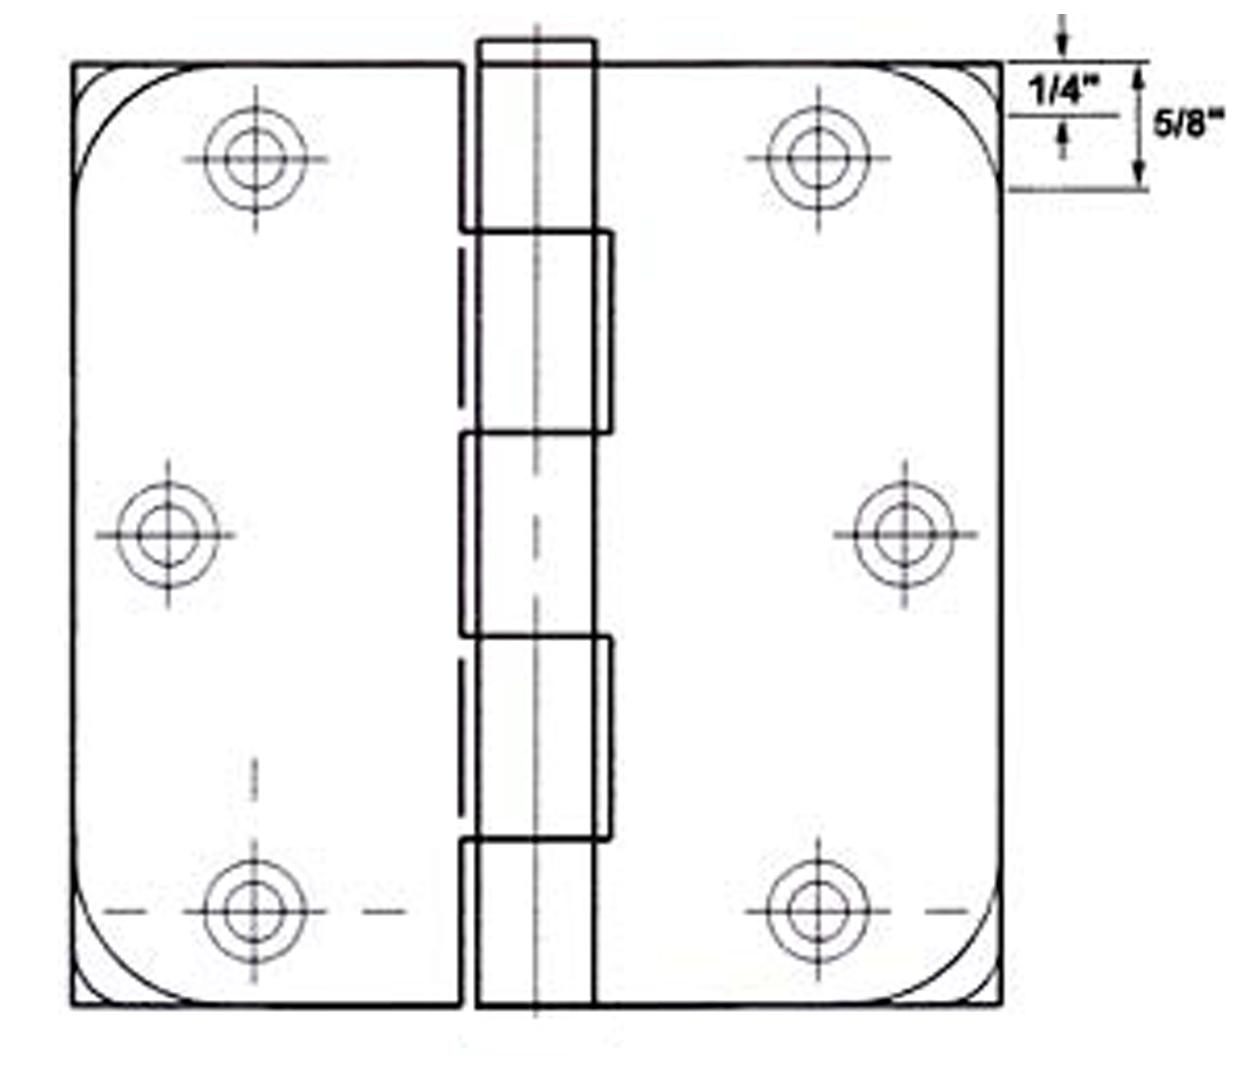 hinge-radius-for-amazon.jpg